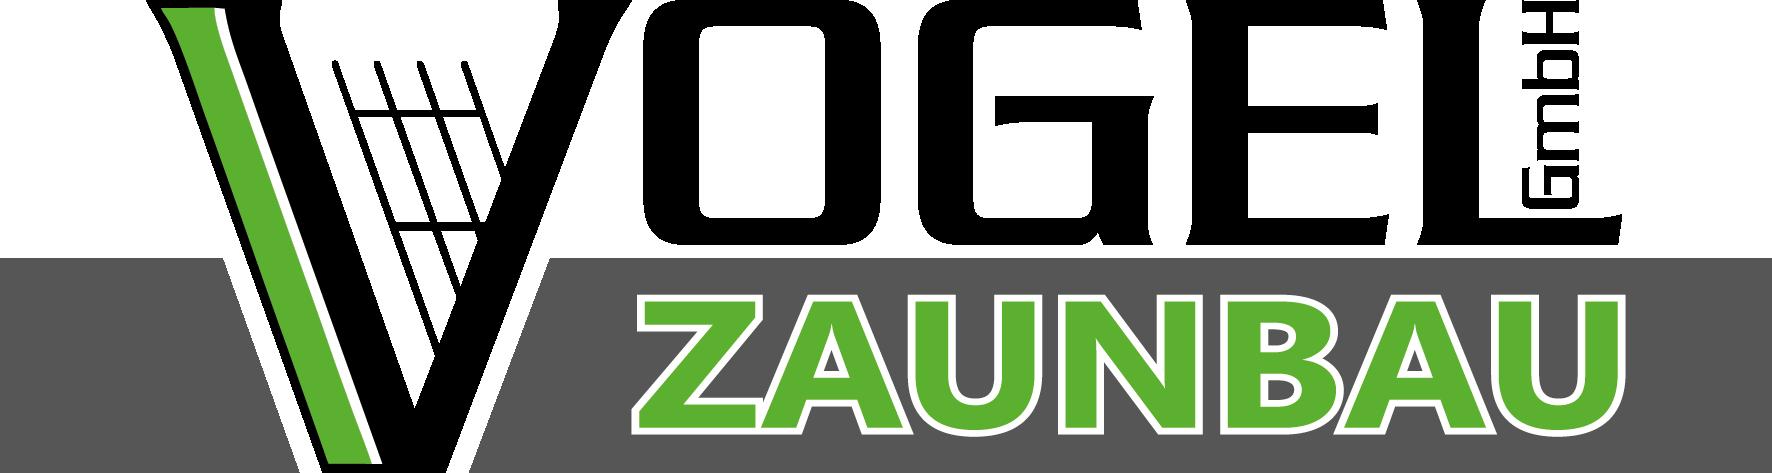 Zaunbau Vogel GmbH